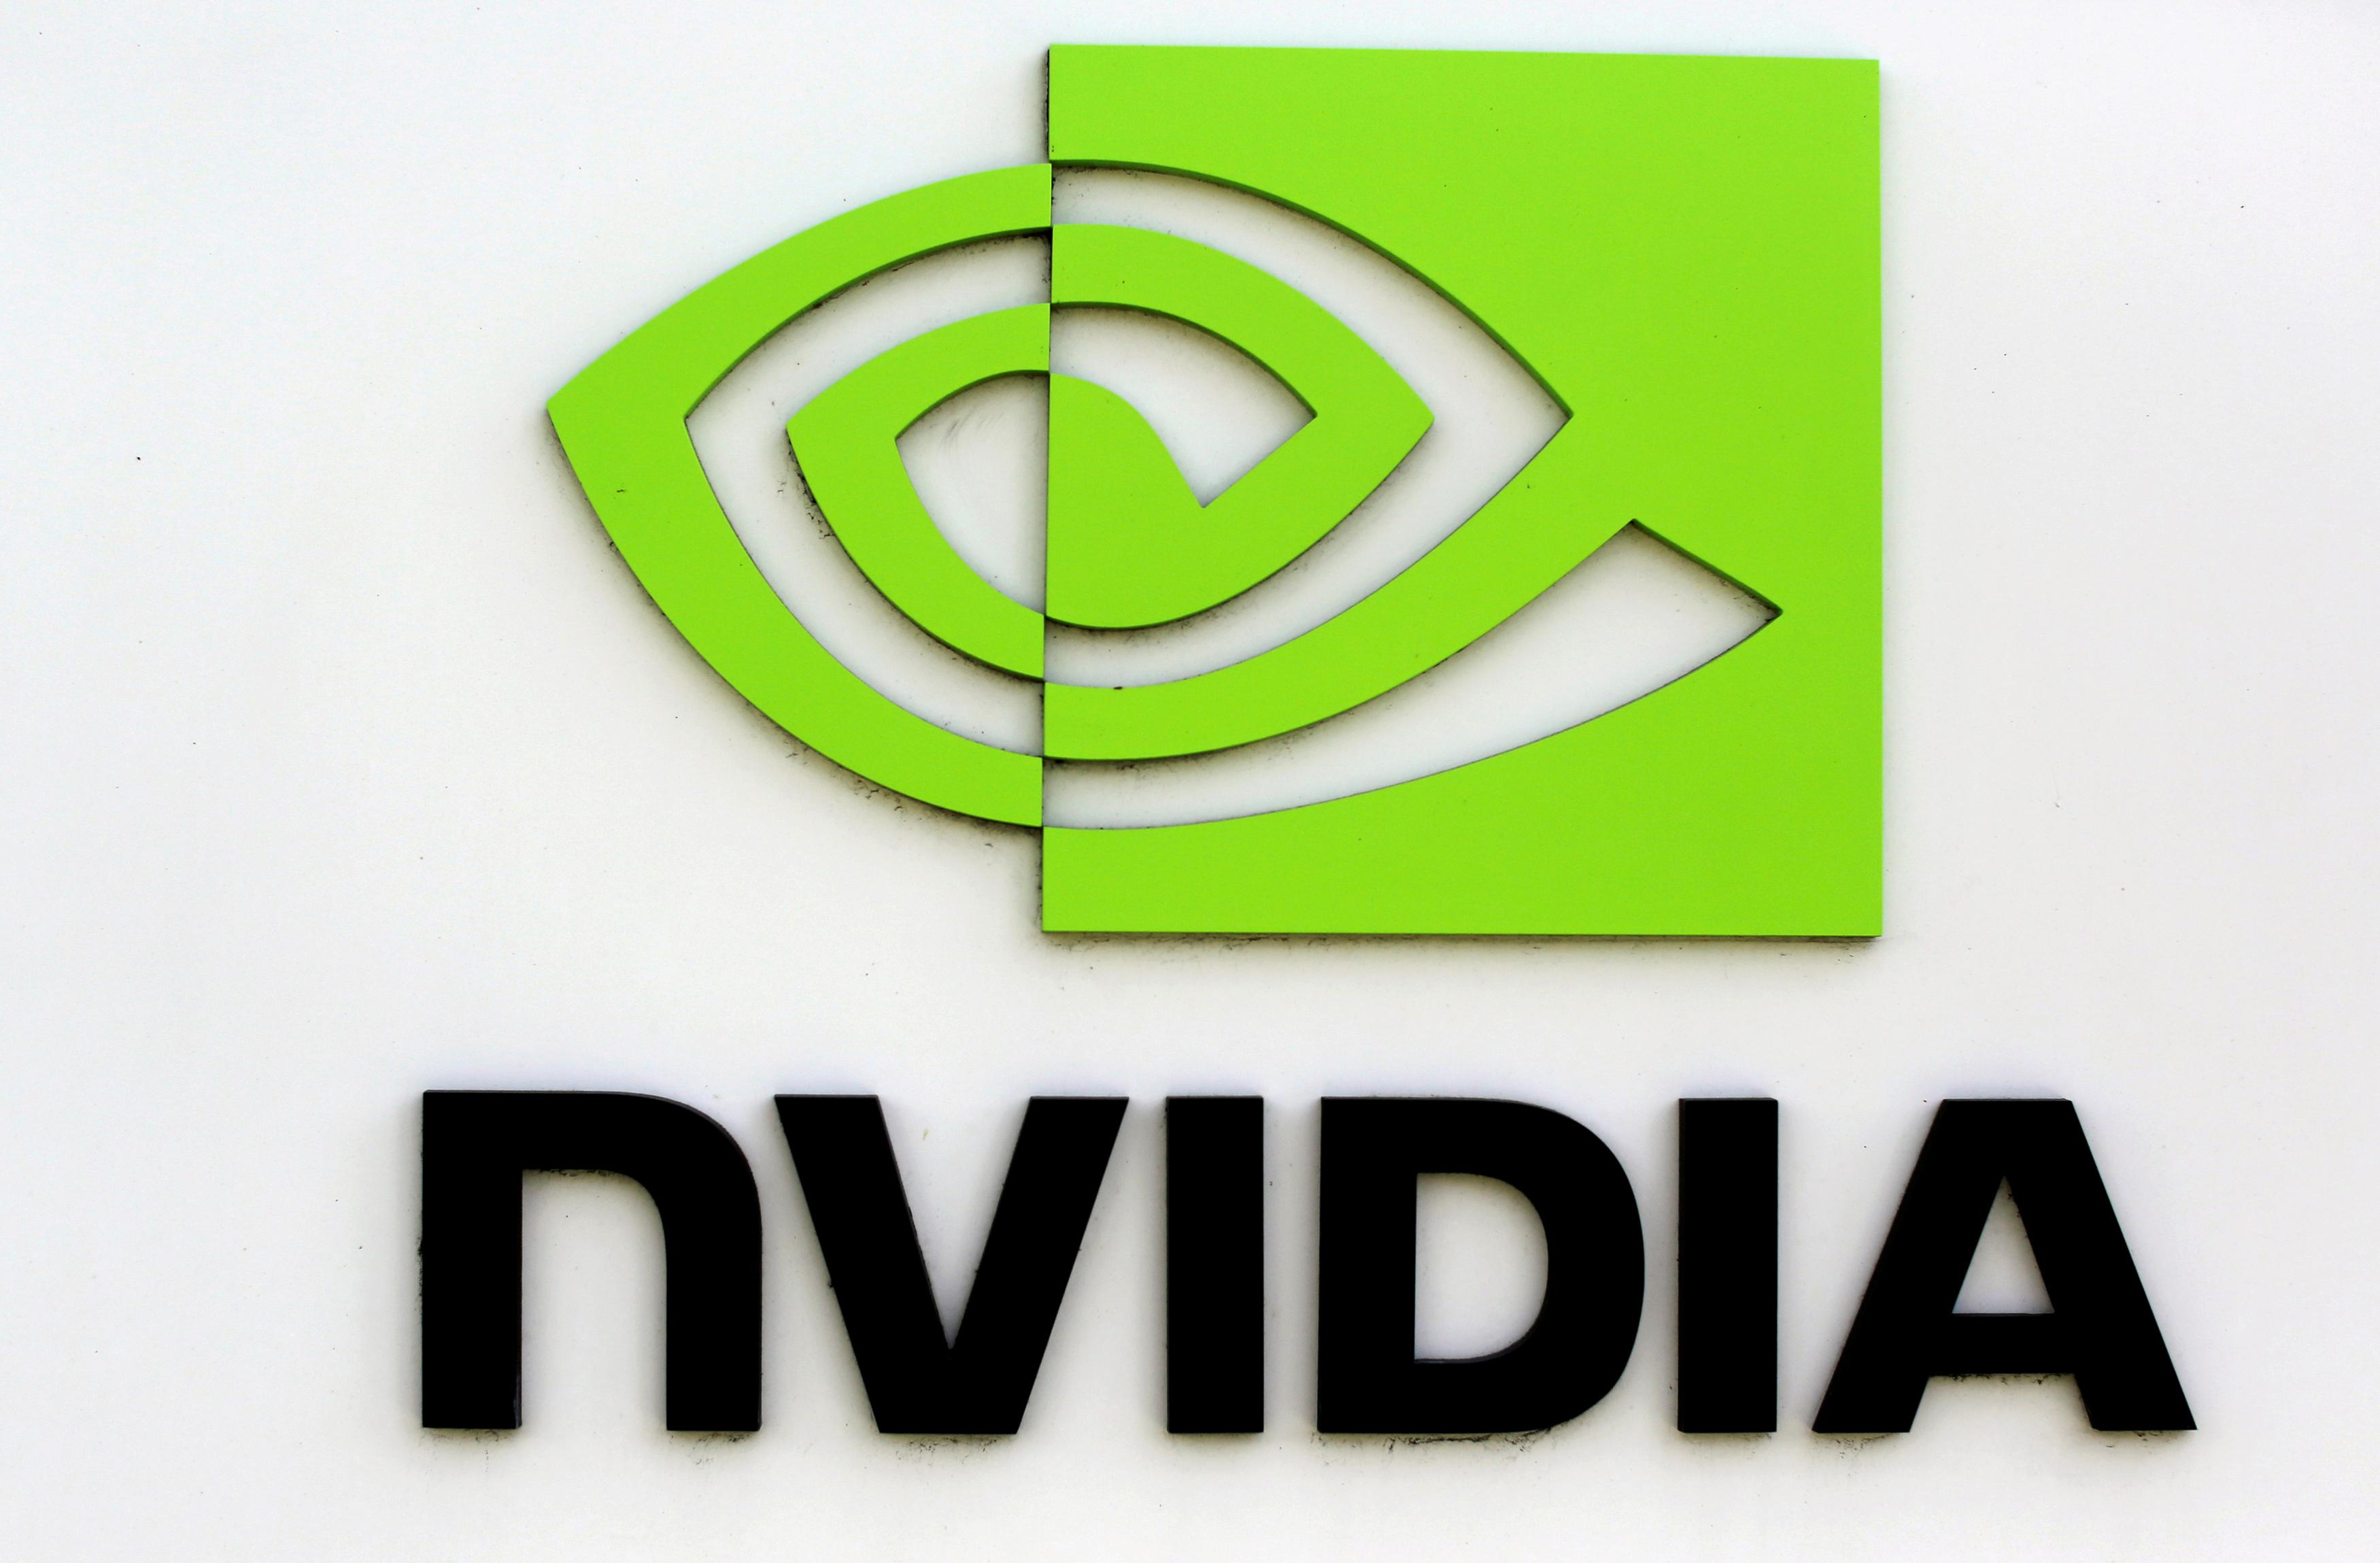 The logo of technology company Nvidia is seen at its headquarters in Santa Clara, California, February 11, 2015.  REUTERS/Robert Galbraith/File Photo